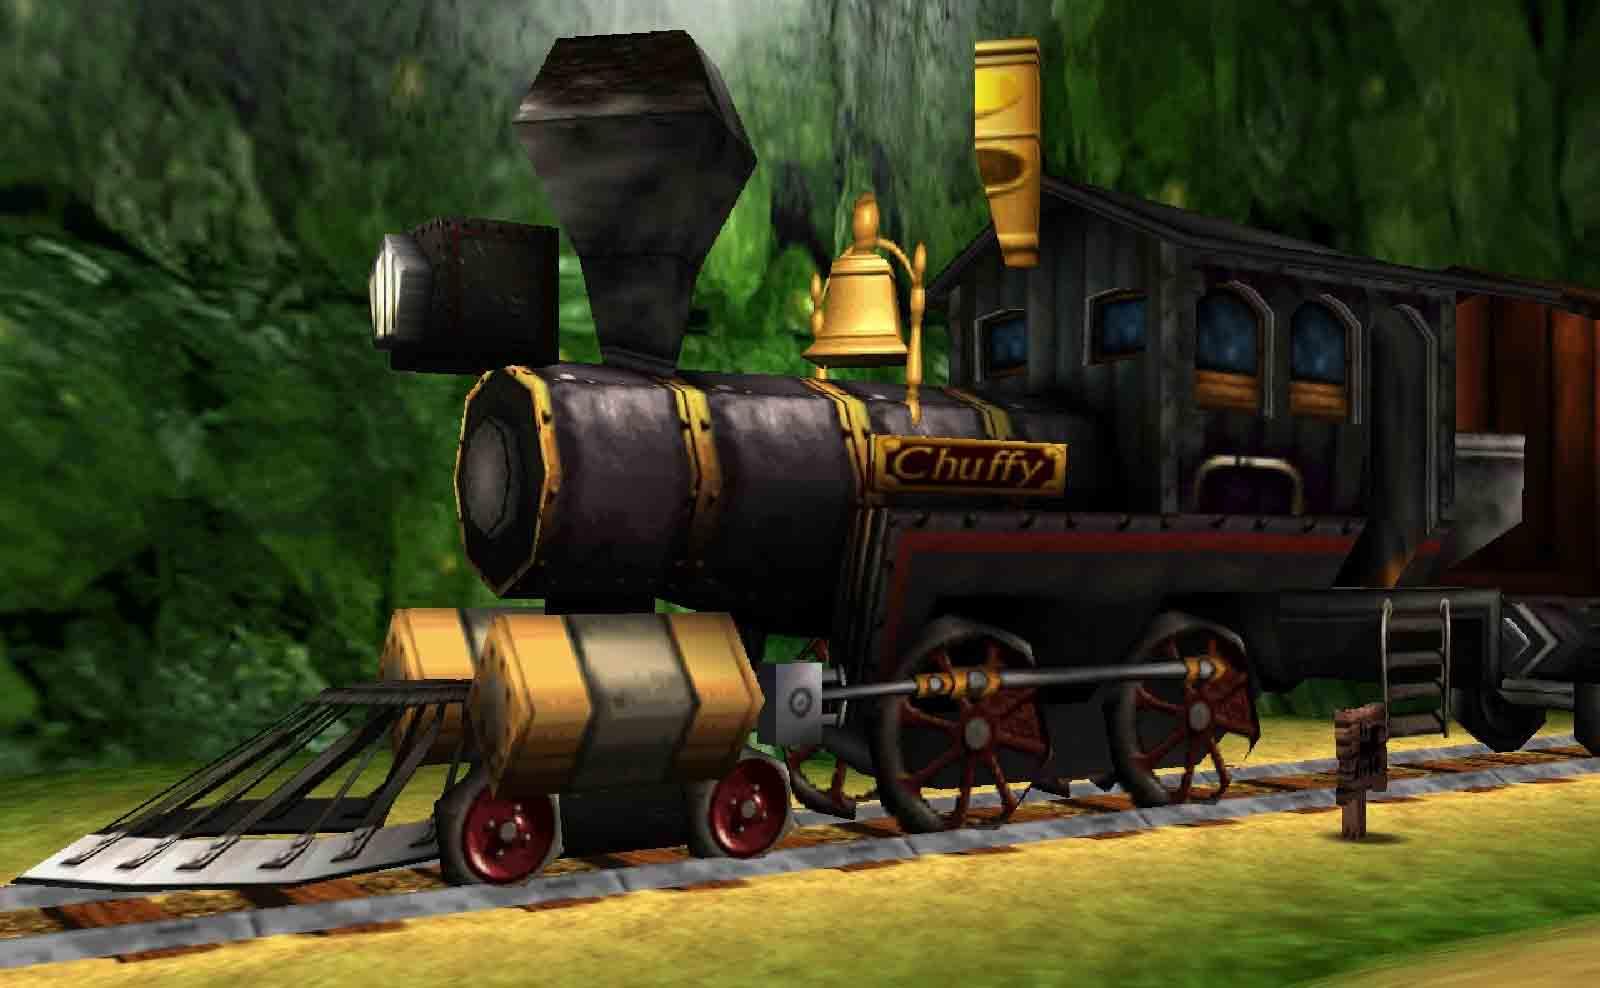 Chuffy the Train! Jesus Christ he's massive innit